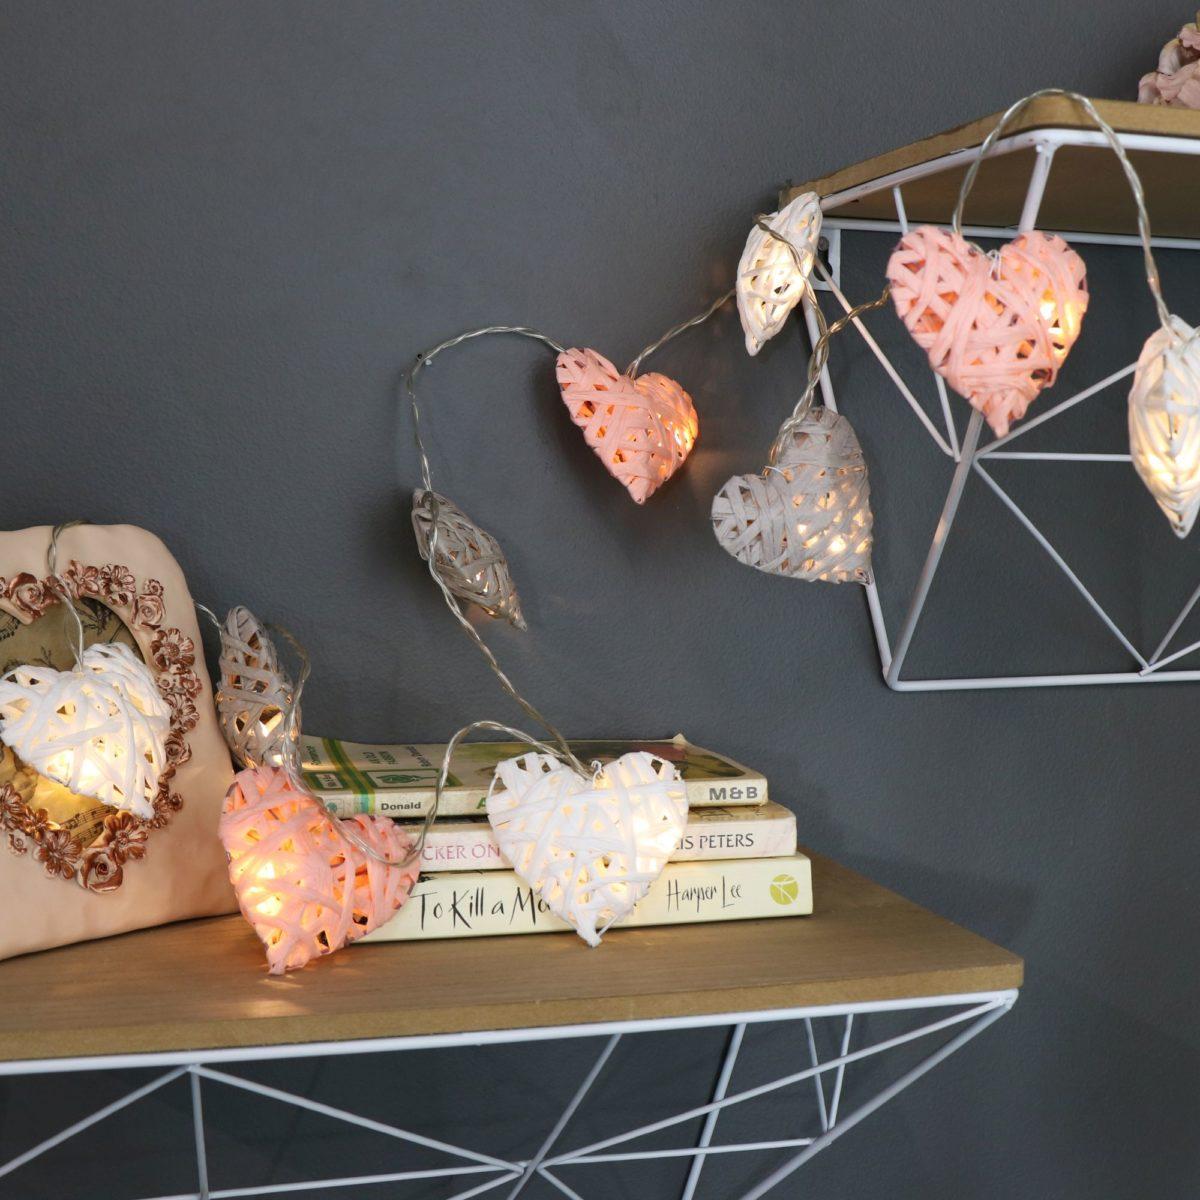 18melody-maison_colourful-heart-led-string-fairy-light-garland-1200x1200.jpg